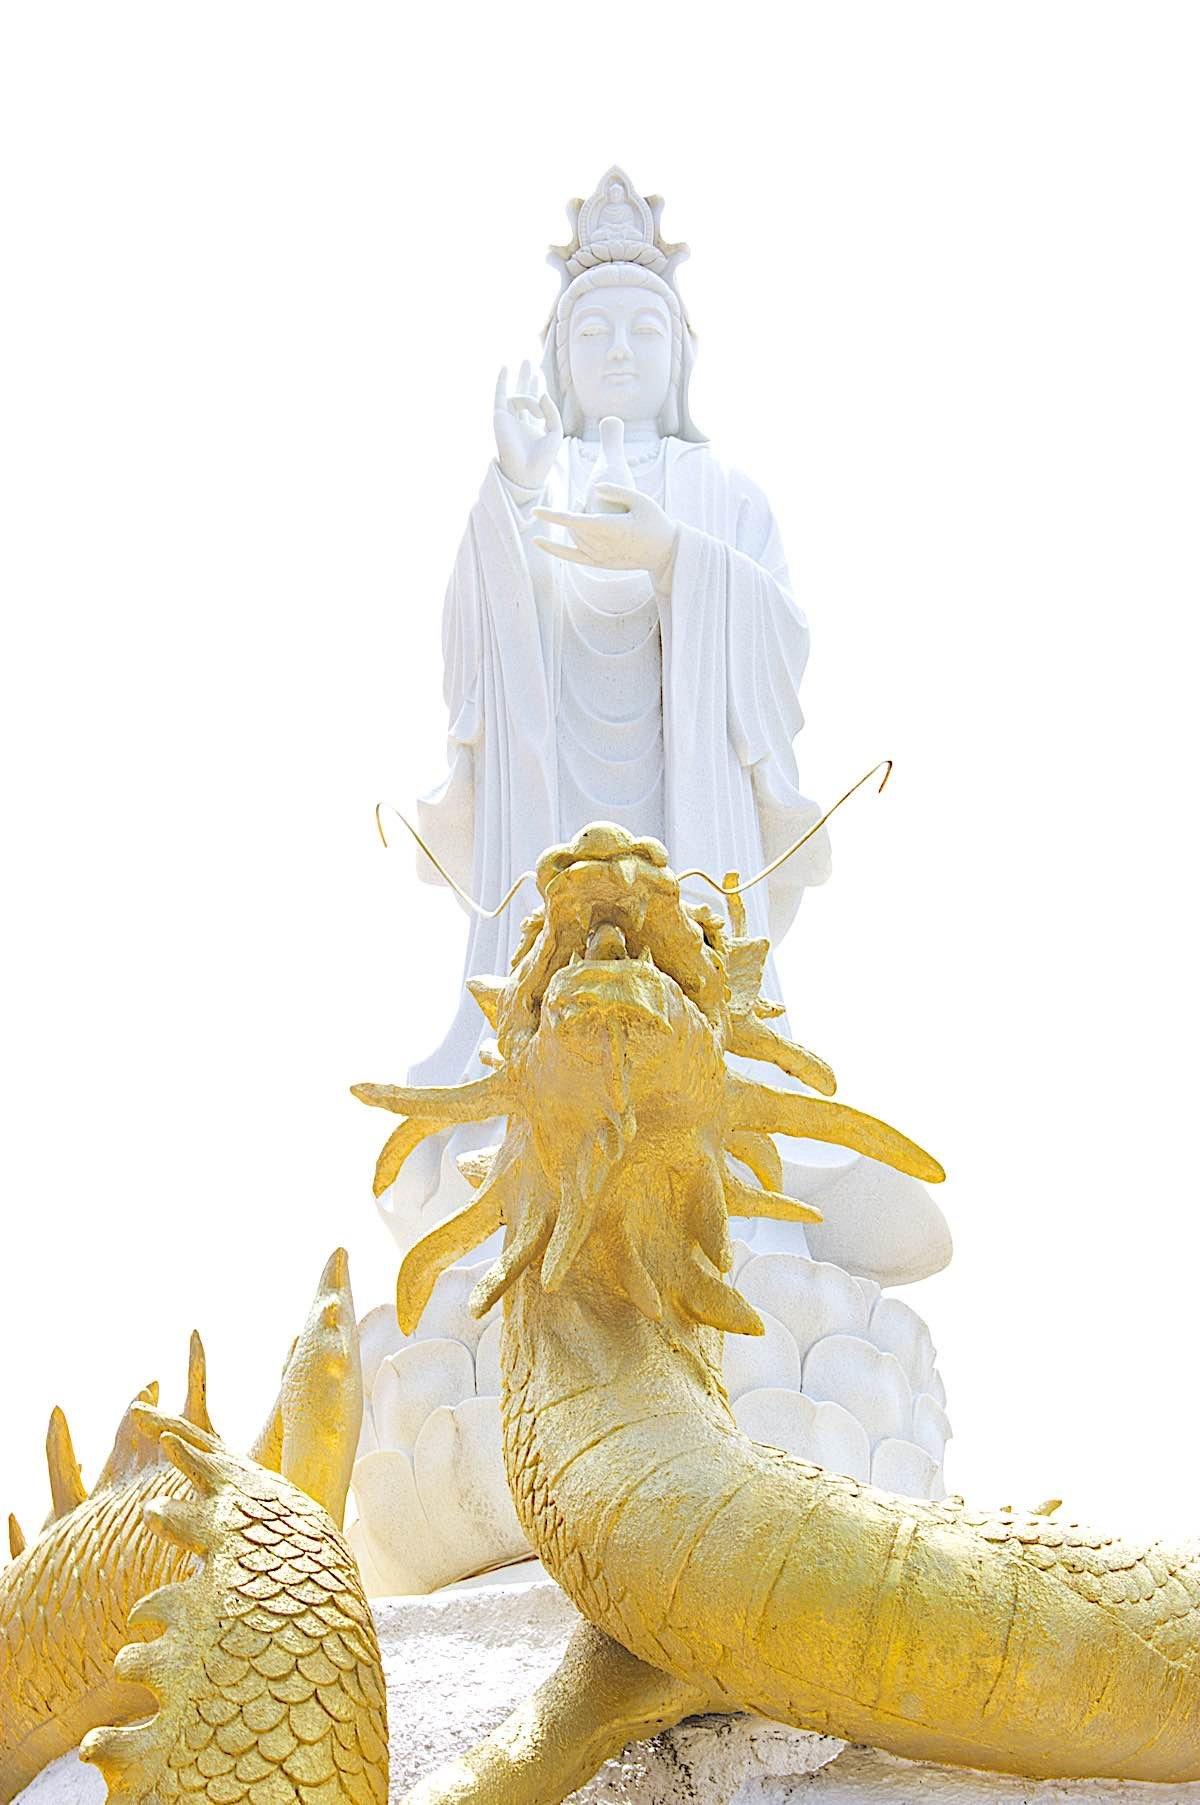 Buddha Weekly Guan Yin standing on immortal dragon dreamstime xxl 21029500 Buddhism